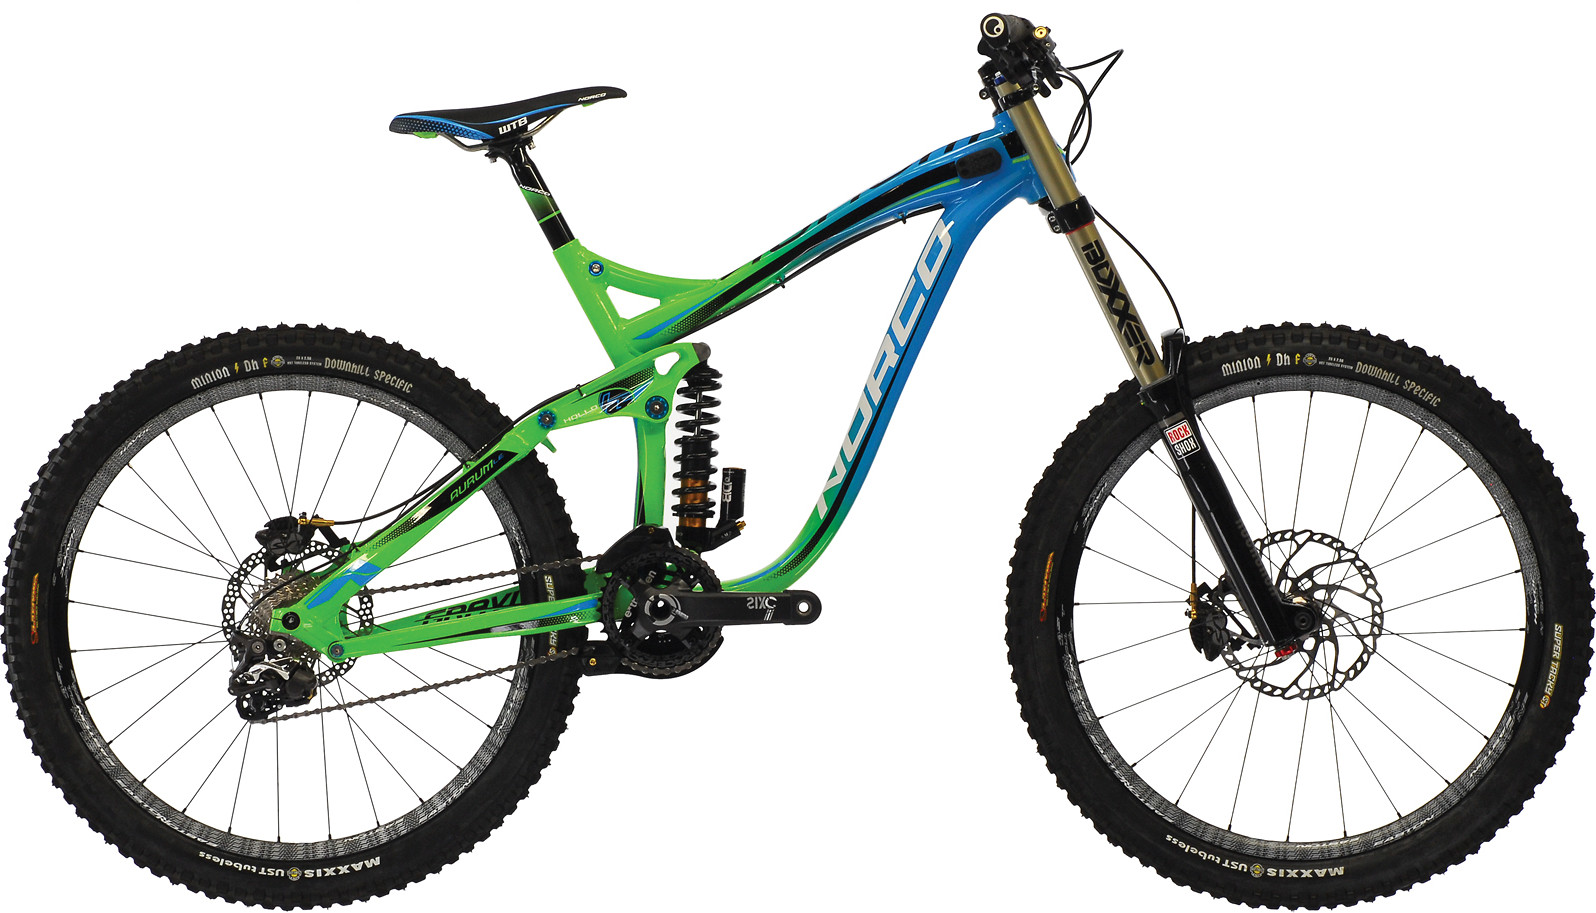 064100-13-01-aurumLE-green-blue